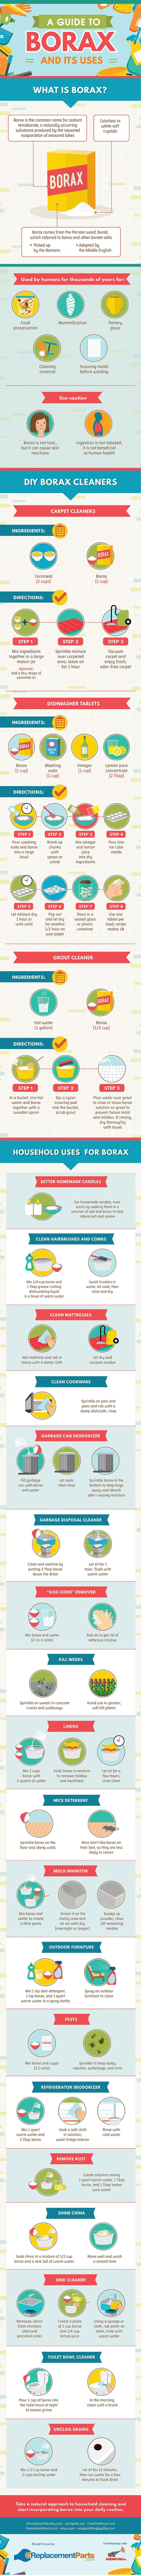 22 Uses for Borax around the house (infographic) | PreparednessMama